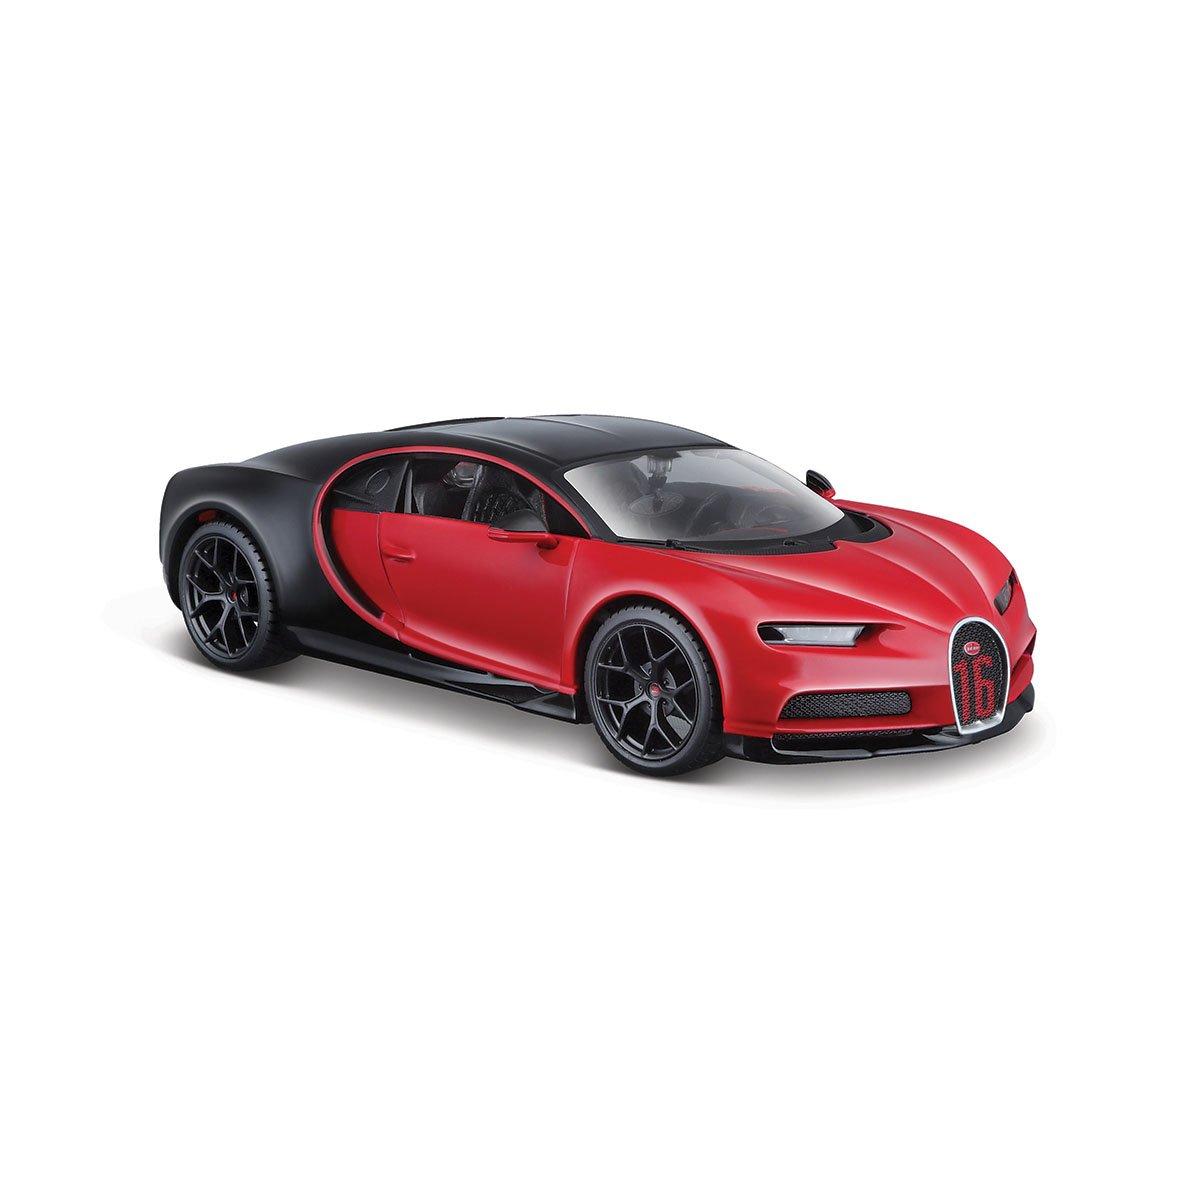 Masinuta Maisto Bugatti Chiron Sport, 1:24, Rosu